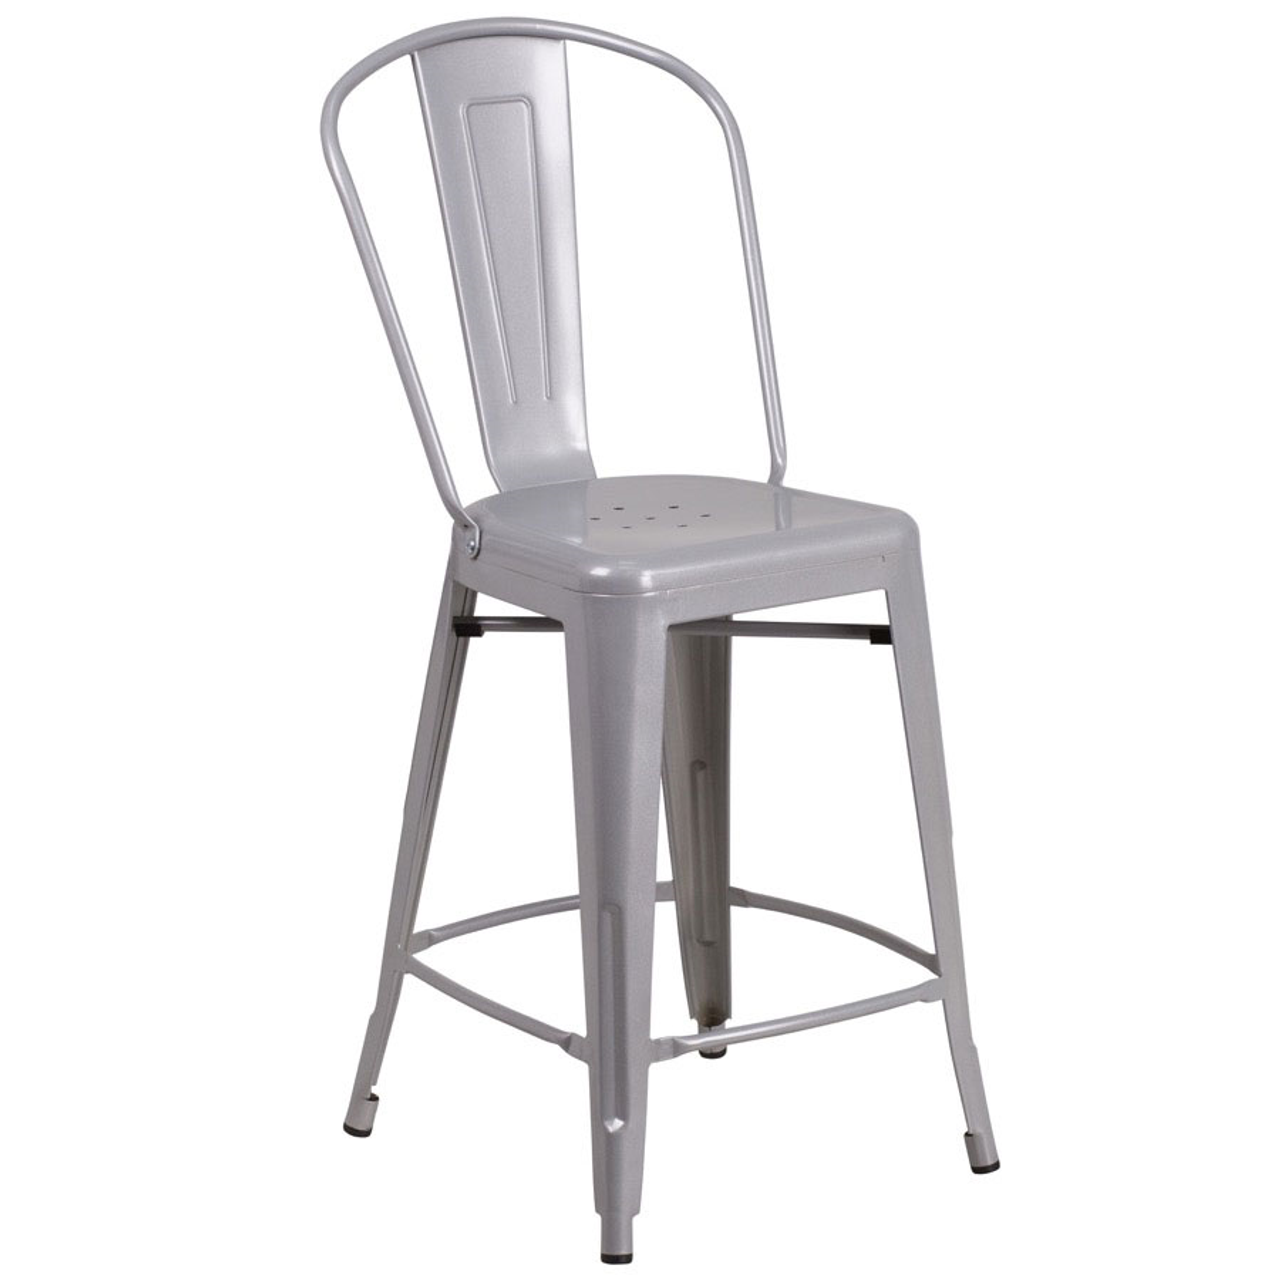 Bar Stool, armless, fan back, steel seat, steel frame, footrest, powder coat finish, bright silver